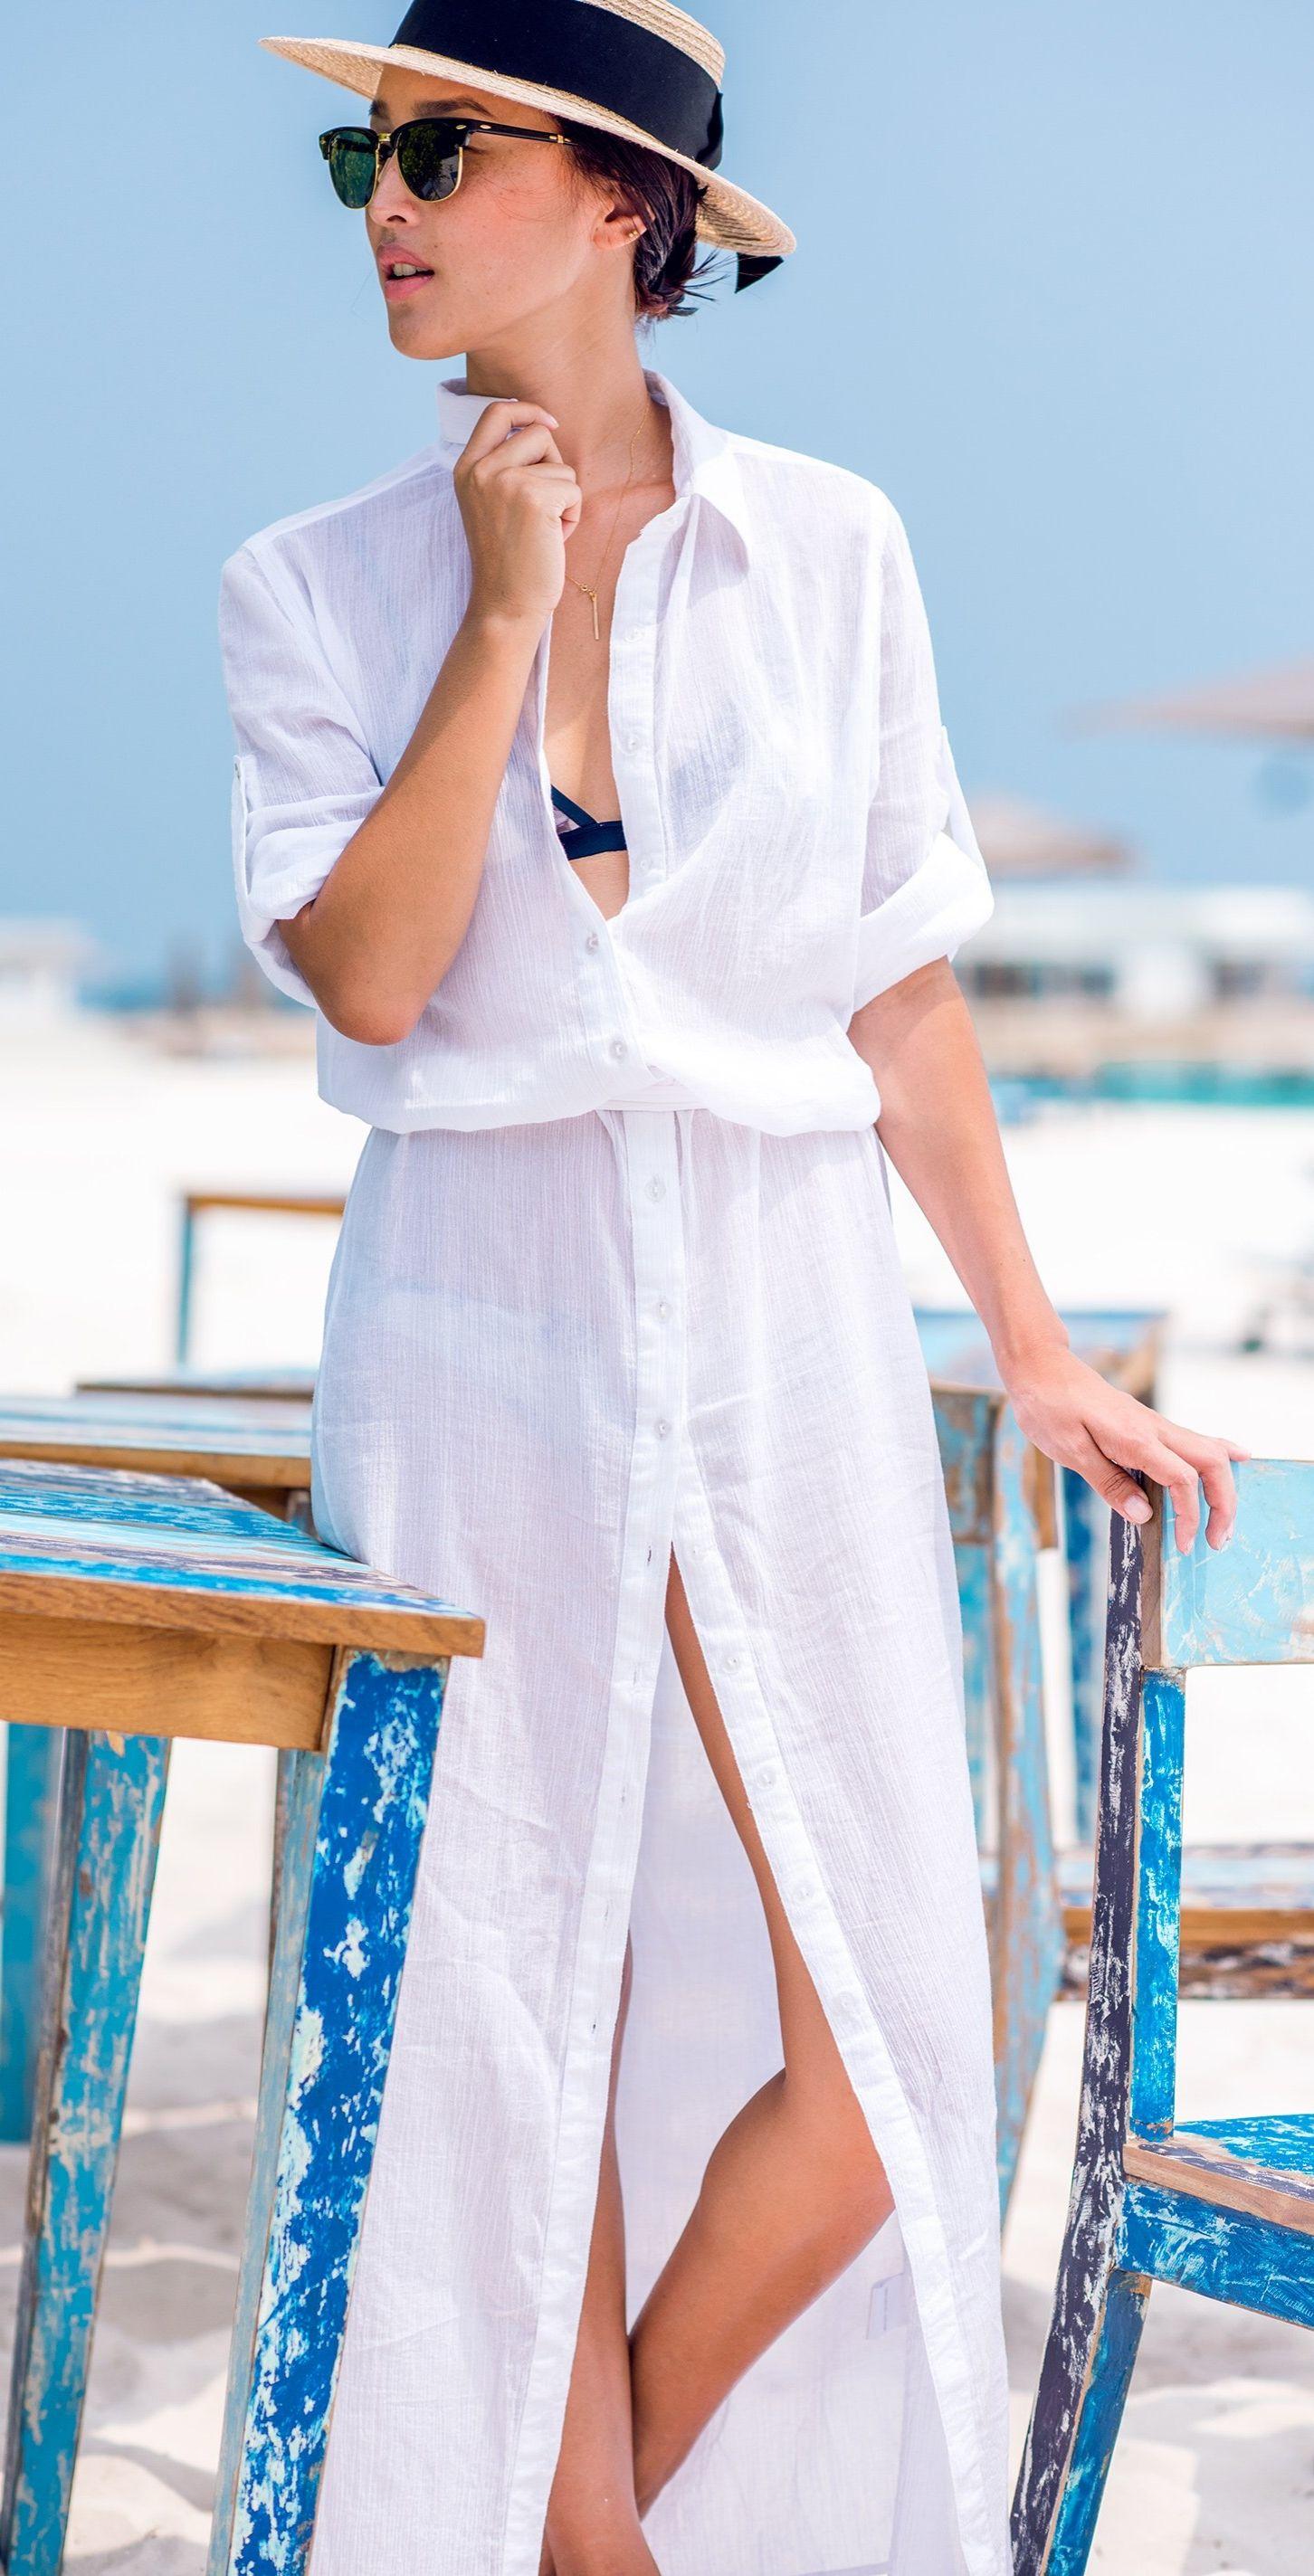 24da7a87531 Maxi shirt dresses work for the beach too. | שמלות בצבע לבן | Maxi ...